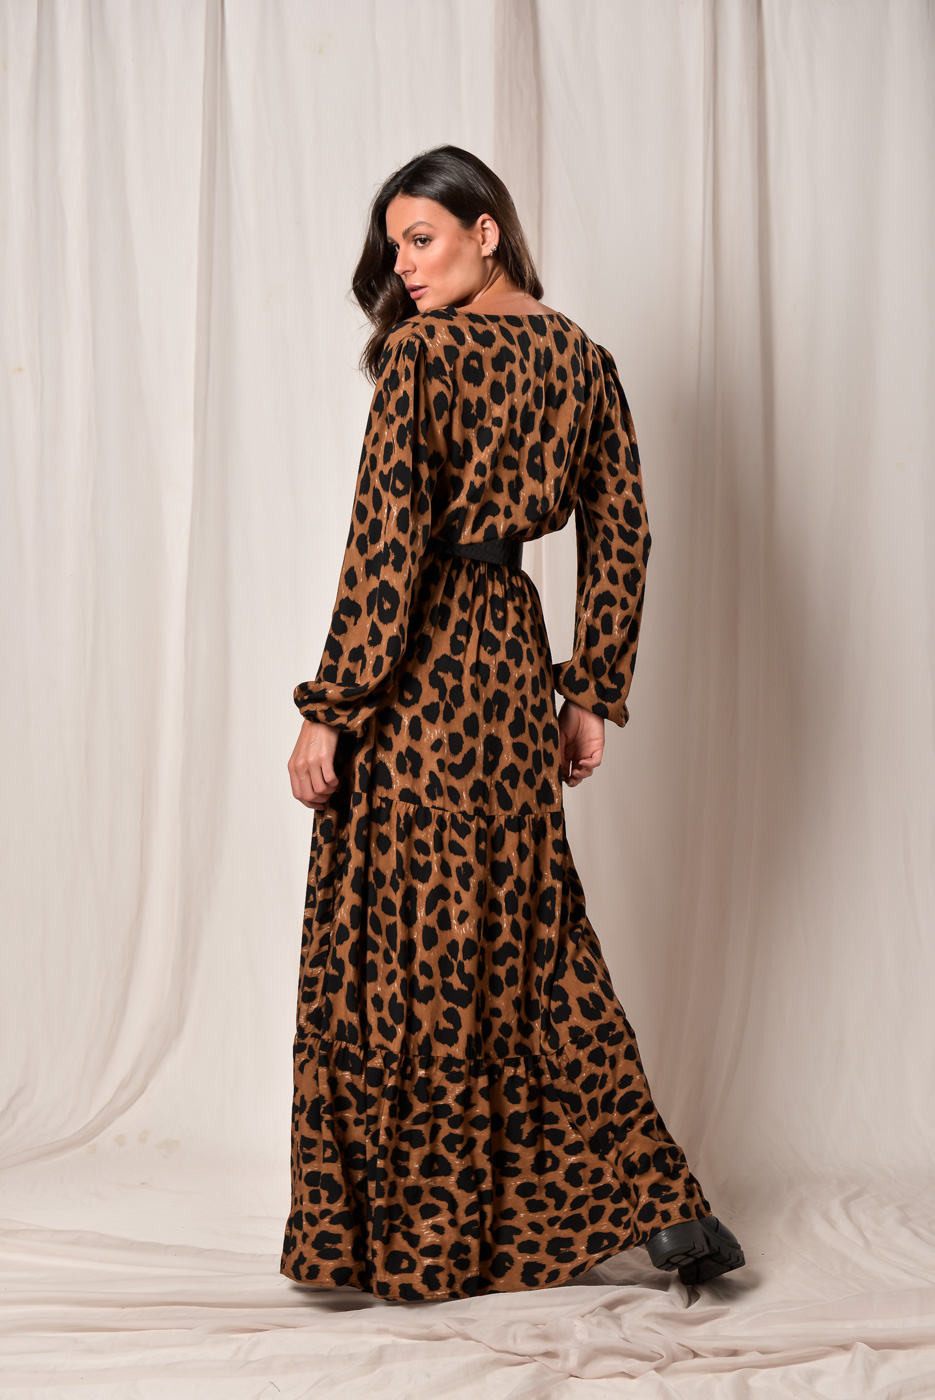 Vestido Animal Print Judite